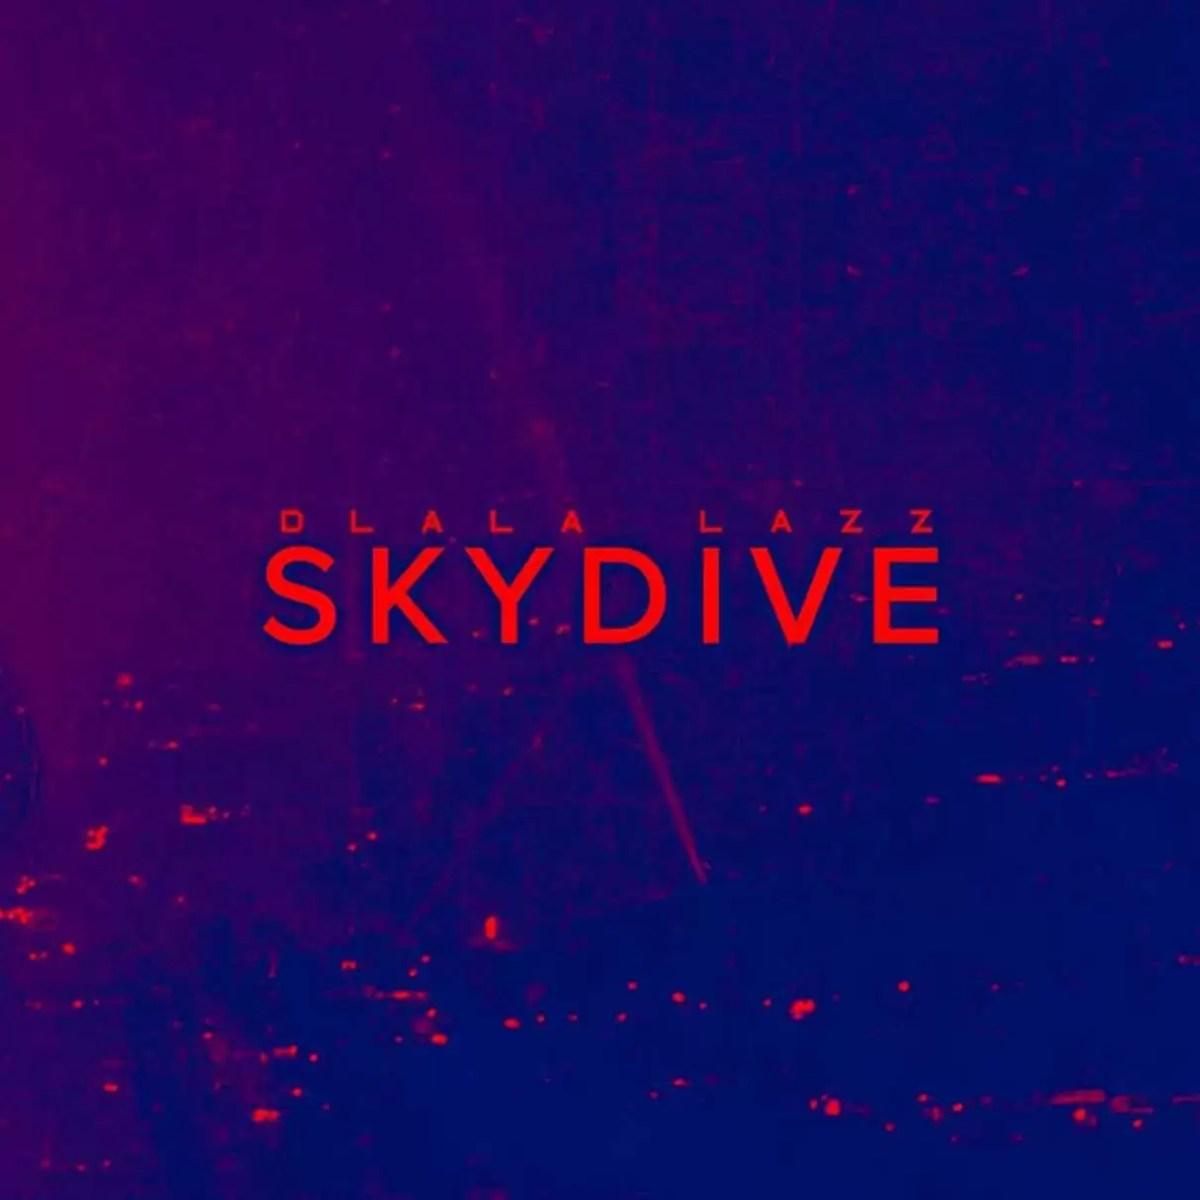 Dlala Lazz - SkyDive